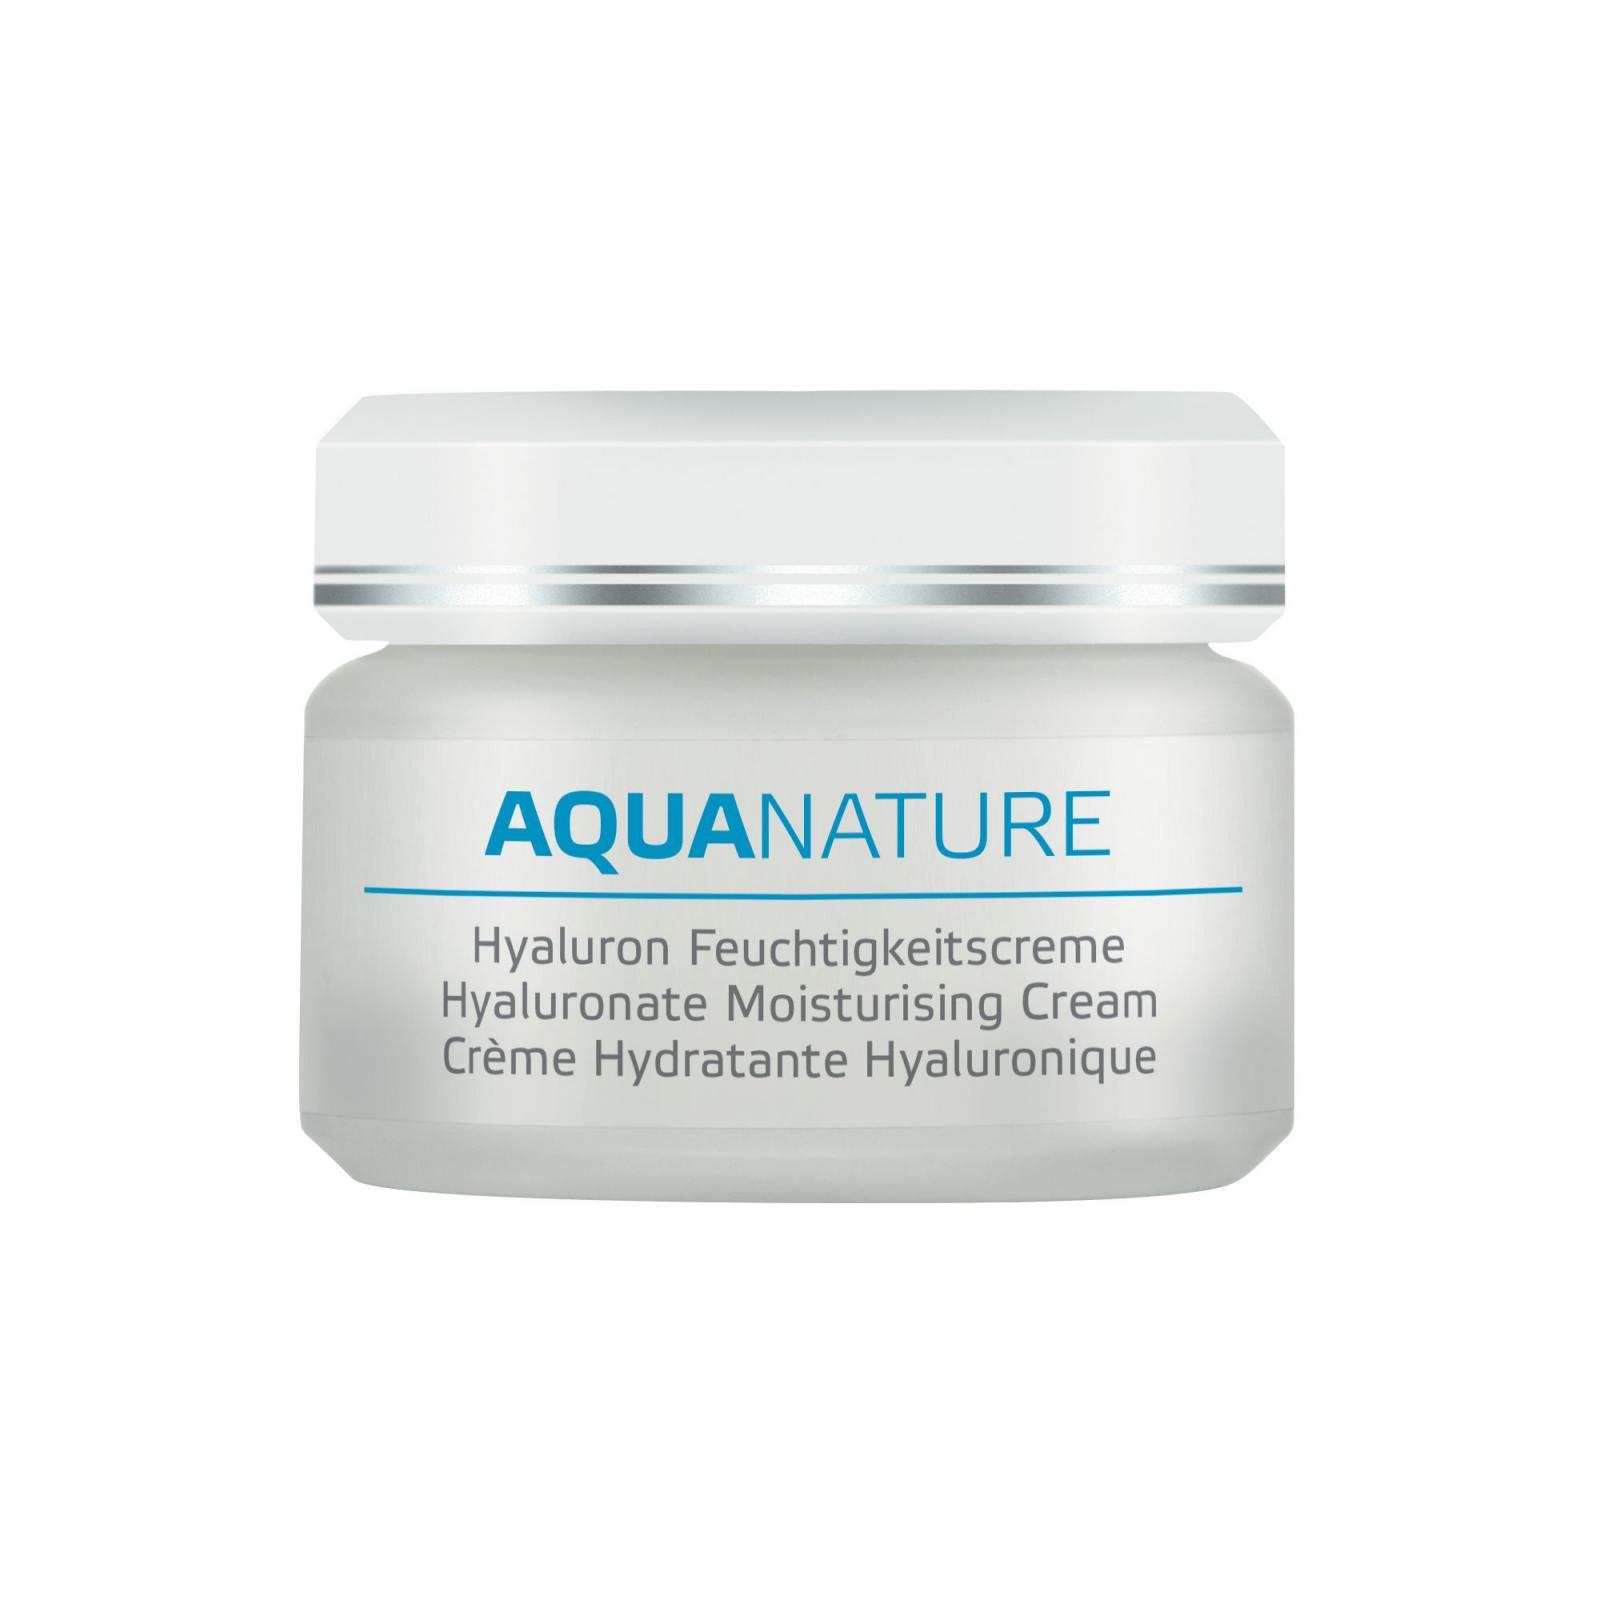 Annemarie Borlind 24h hydratační krém, Aquanature 50 ml